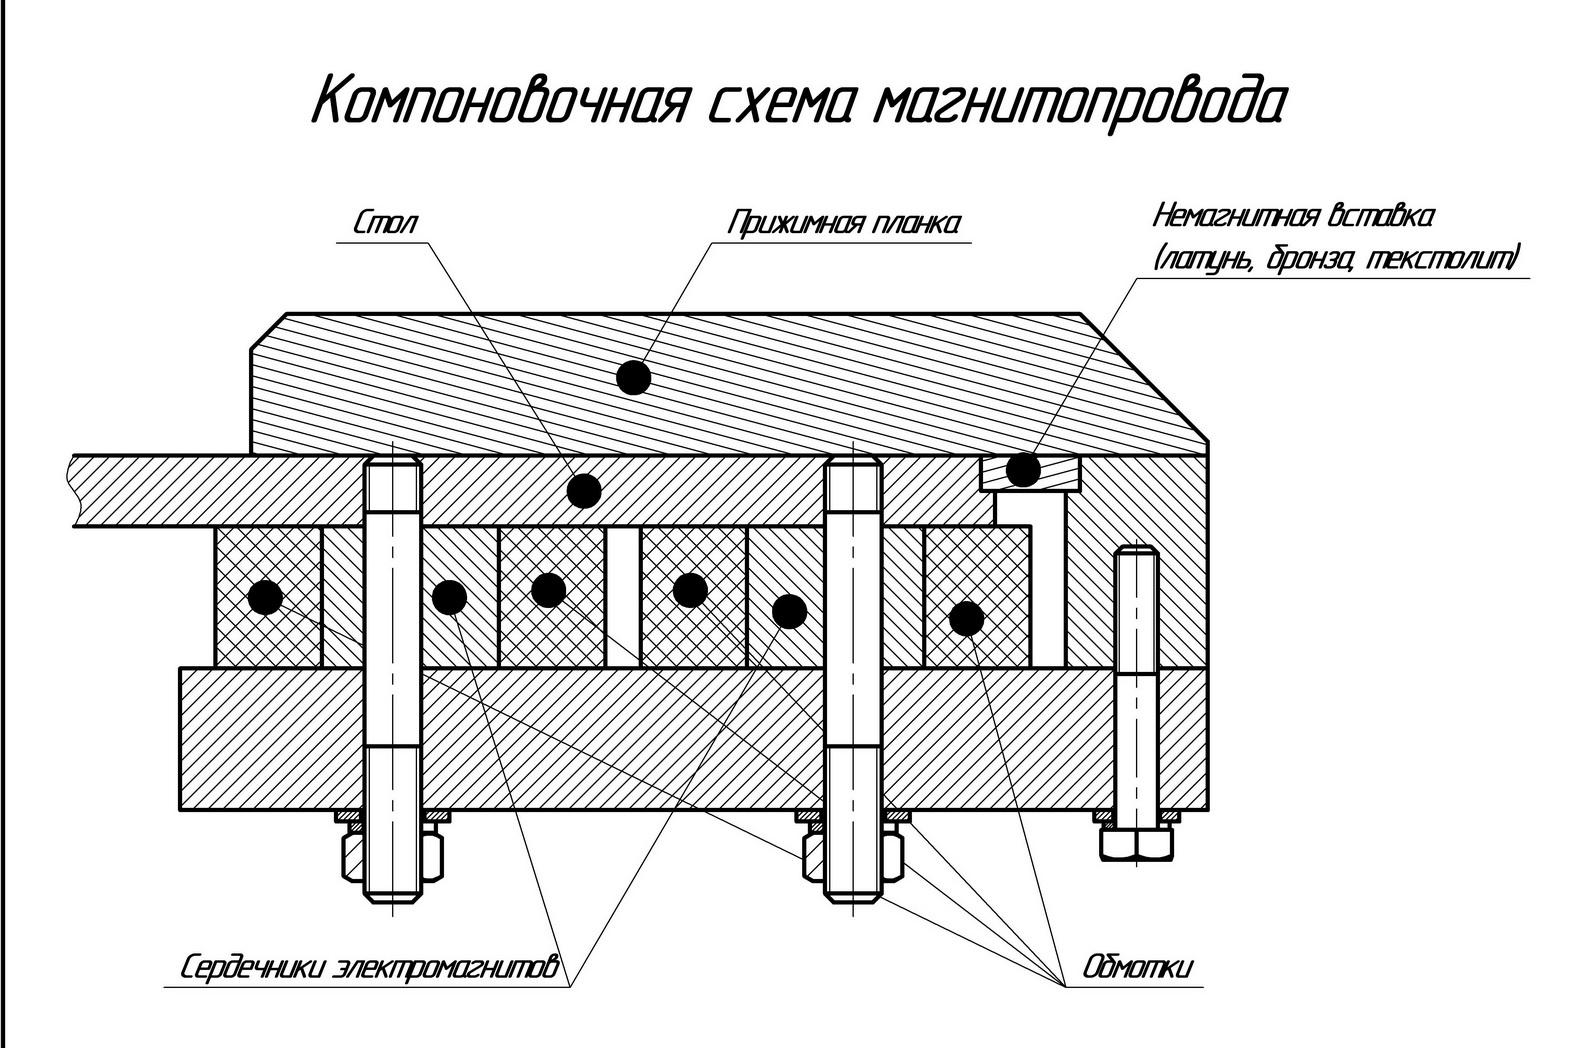 Прикидка магнитного листогиба 001a